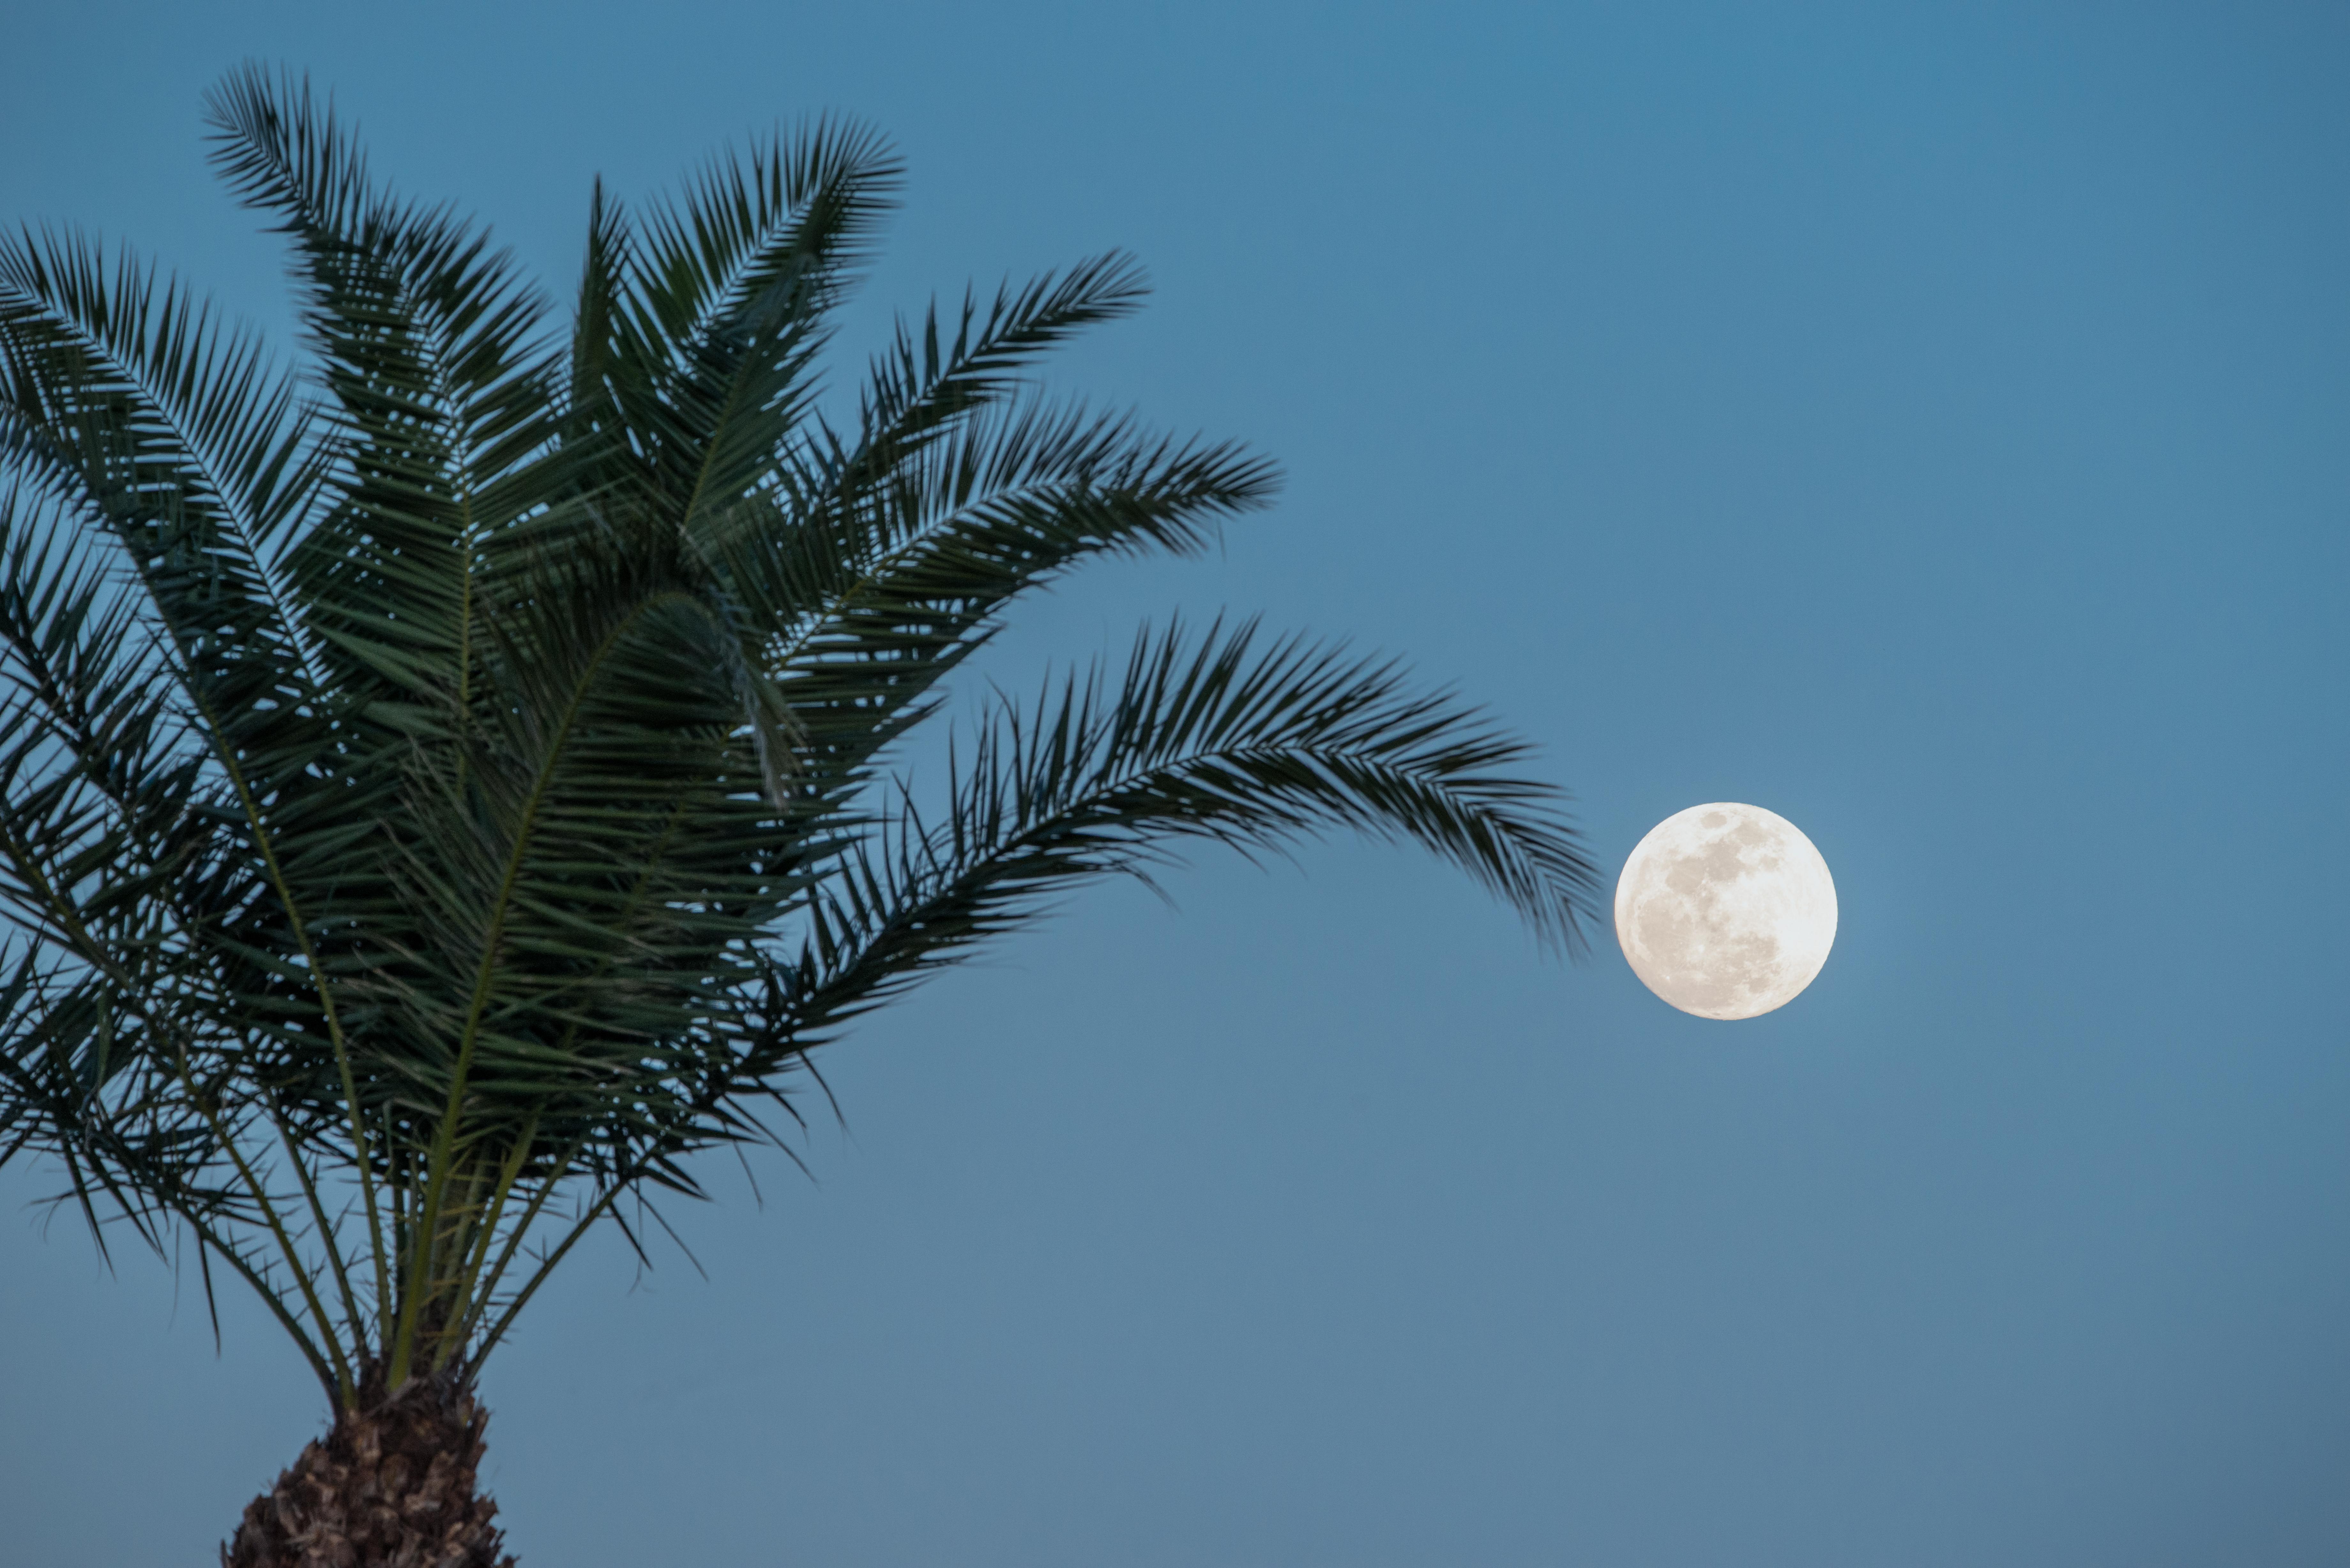 #palm, #moon, #supermoon, #nikon, #tamron, #fullmoon, #florida, #january30